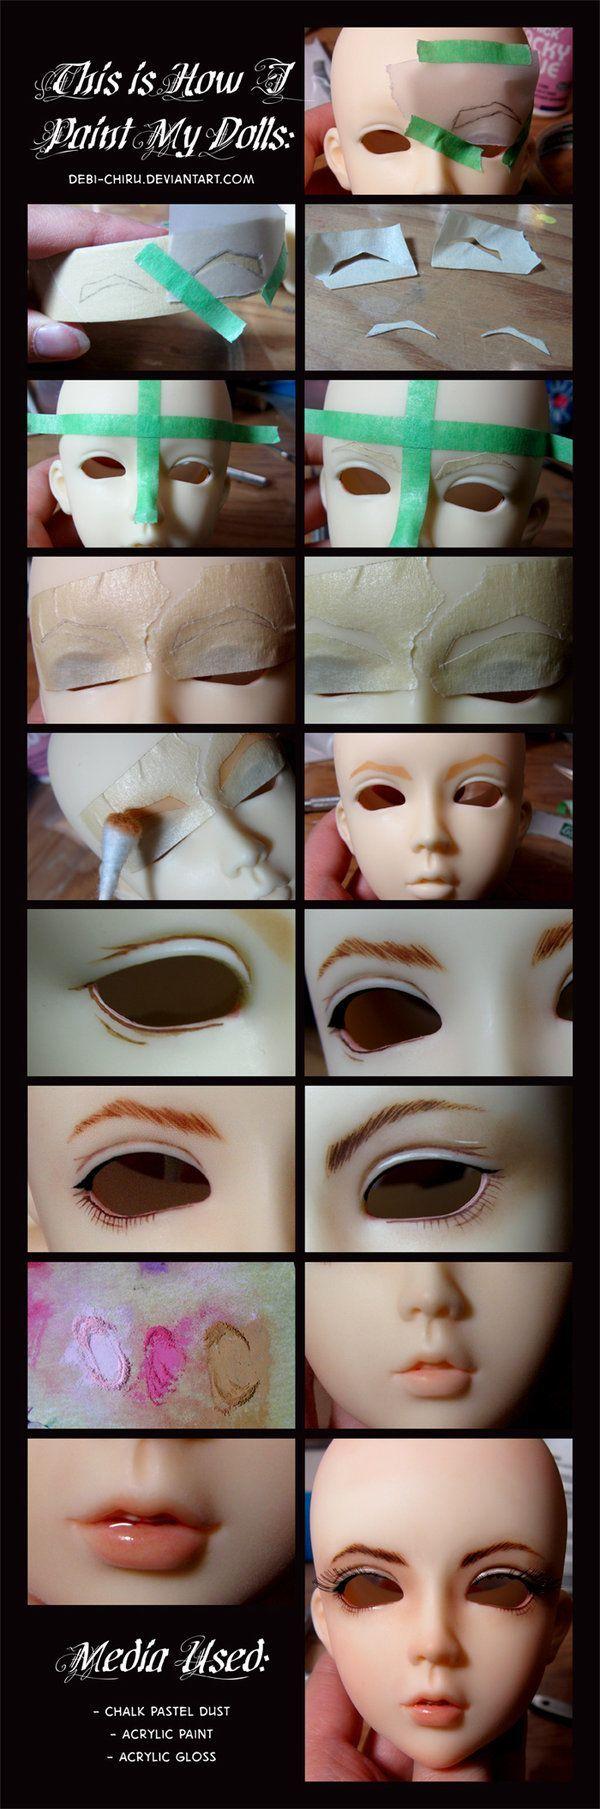 Doll Painting Process by Debi-Chiru.deviantart.com on @deviantART